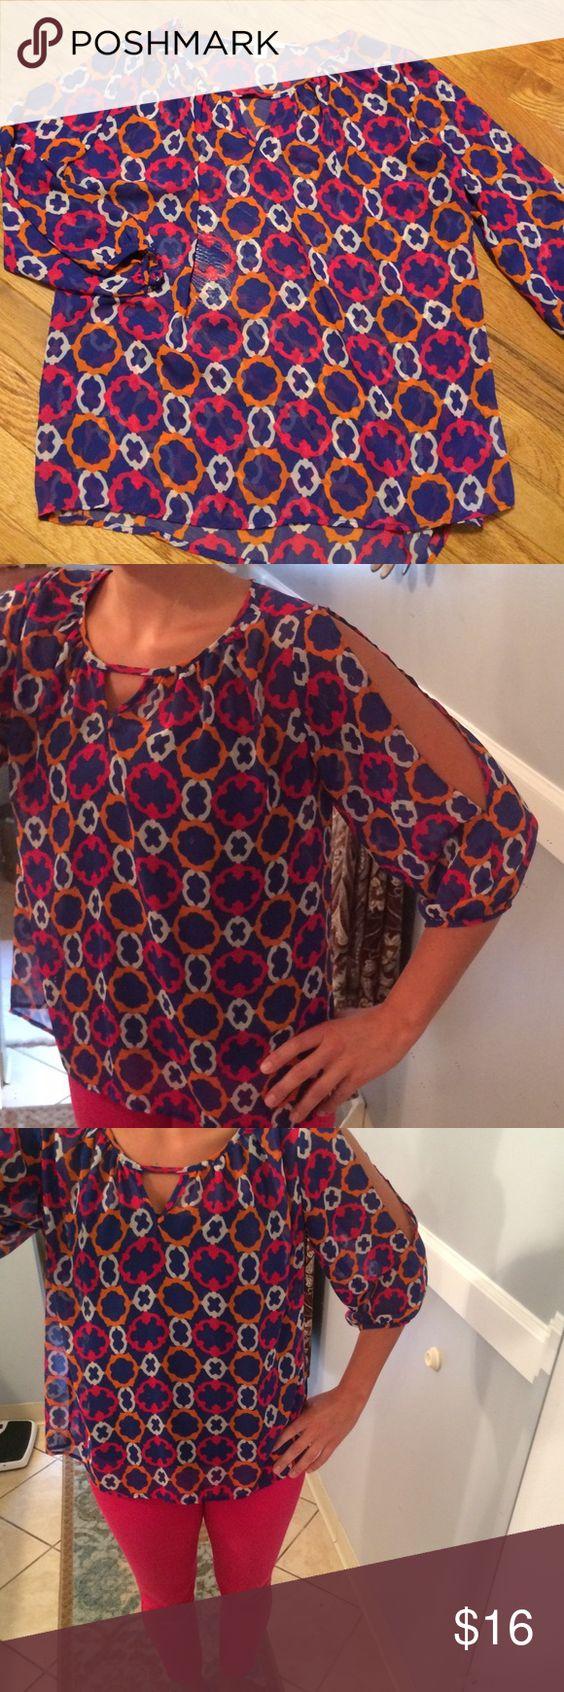 Cute boutique blouse Cute boutique blouse with open/cutout sleeves. NWOT. Miami Tops Blouses